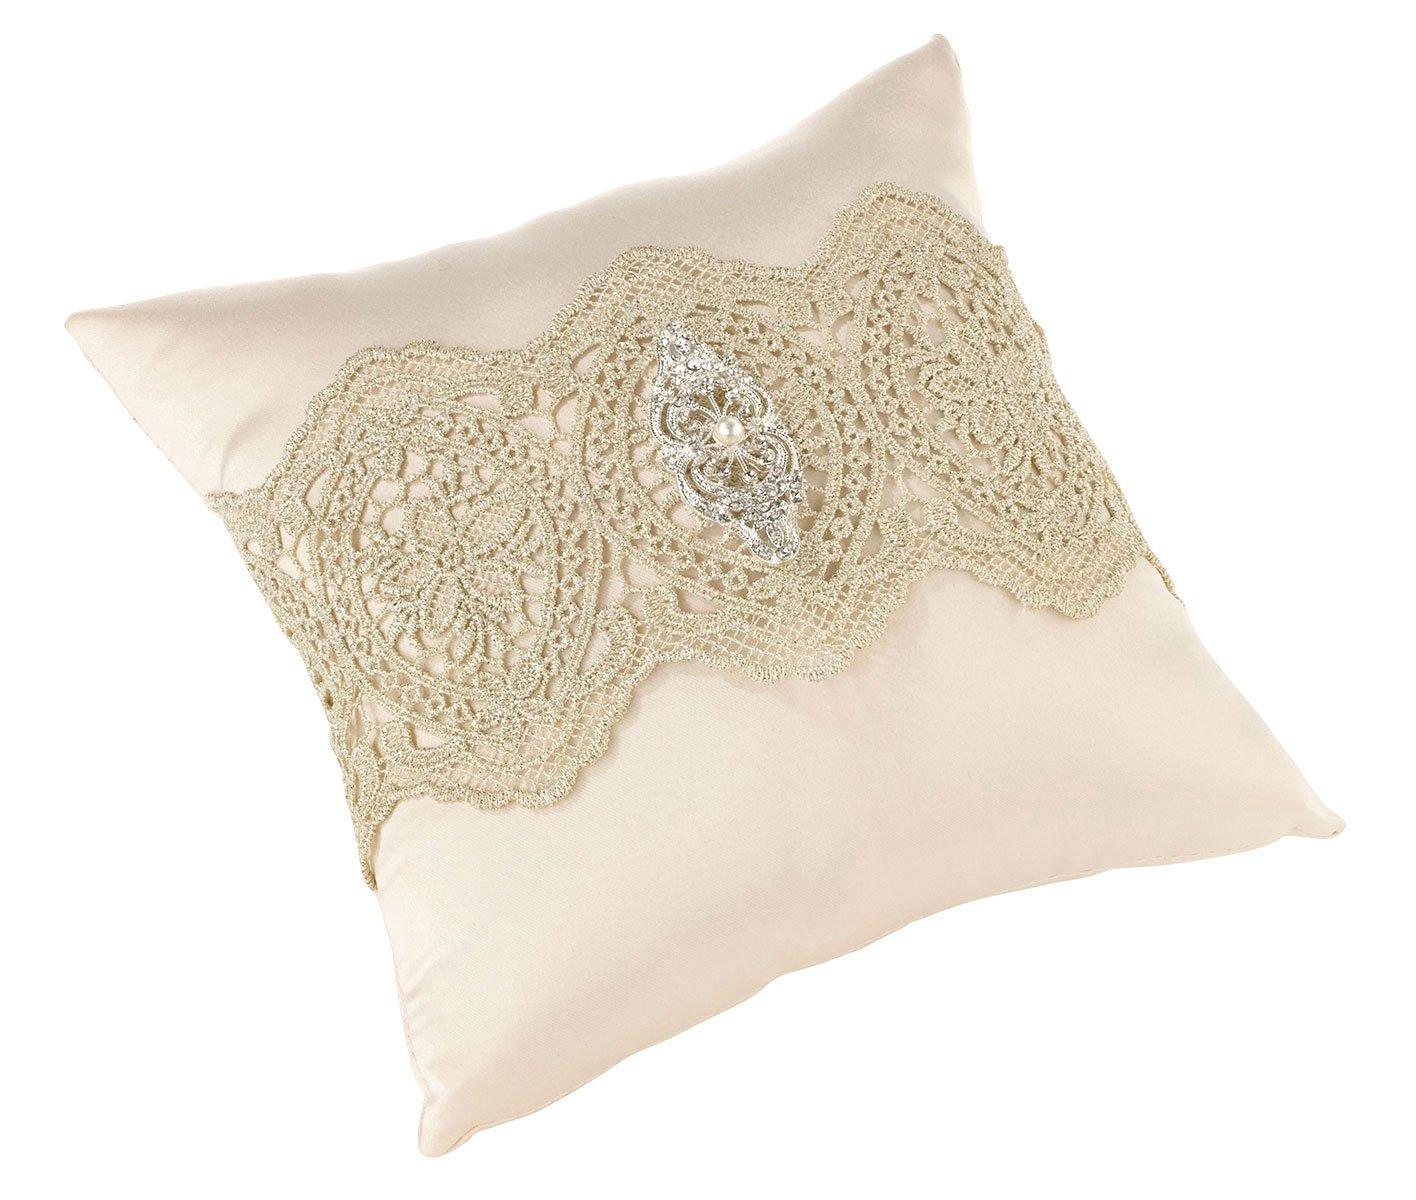 Lillian Rose Vintage Gold Lace Ivory Satin Wedding Ring Pillow